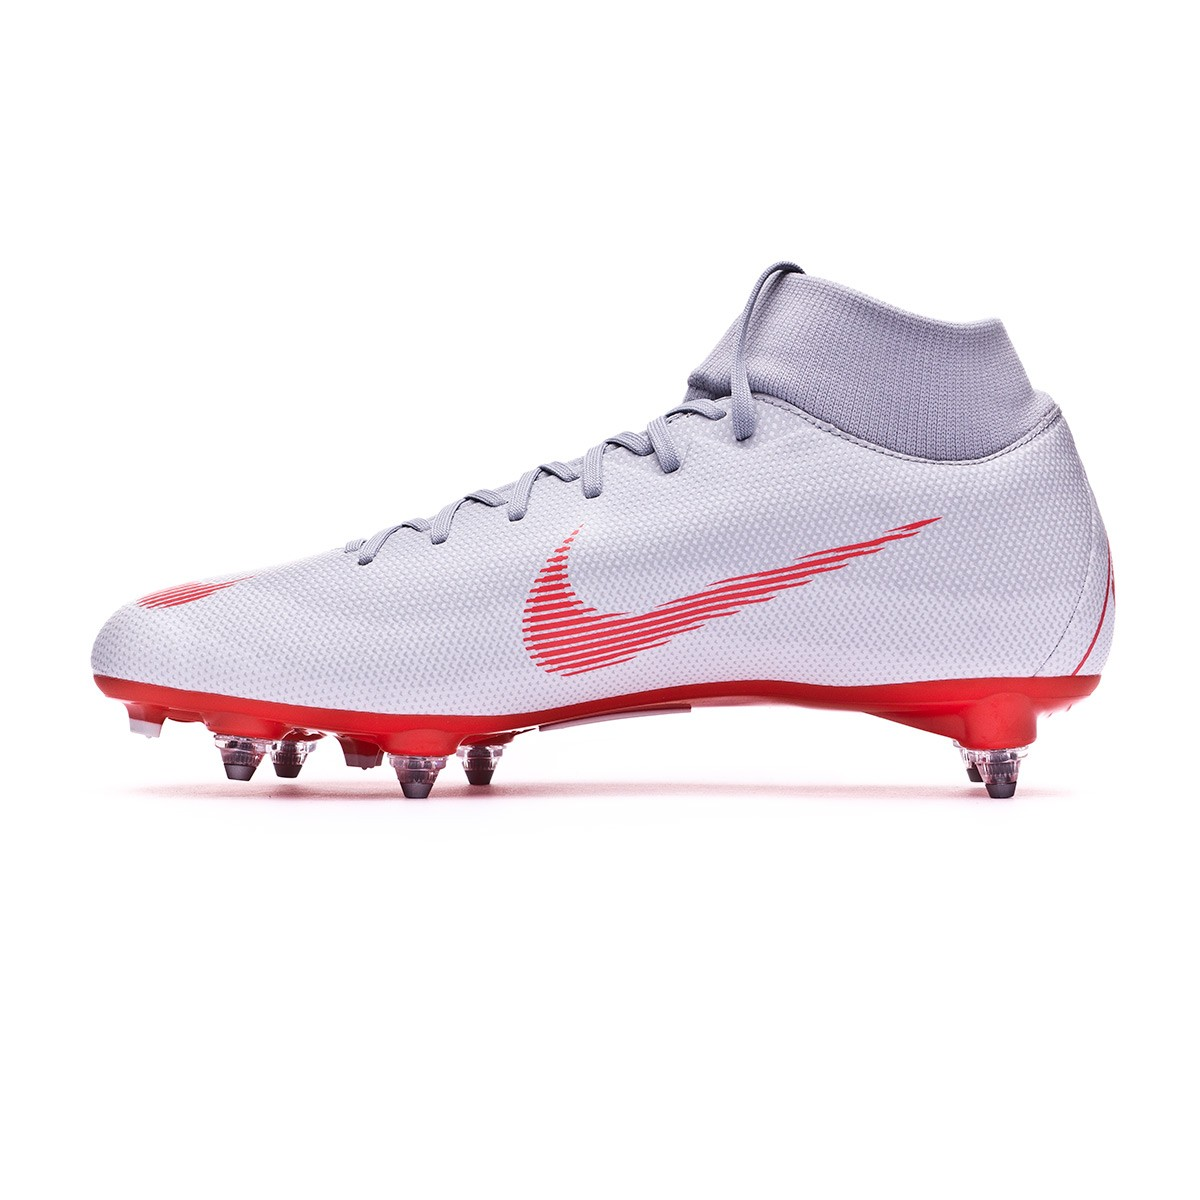 buy popular 2c0ac dfb00 Football Boots Nike Mercurial Superfly VI Academy SG-Pro Wolf grey-Light  crimson-Pure platinum - Tienda de fútbol Fútbol Emotion